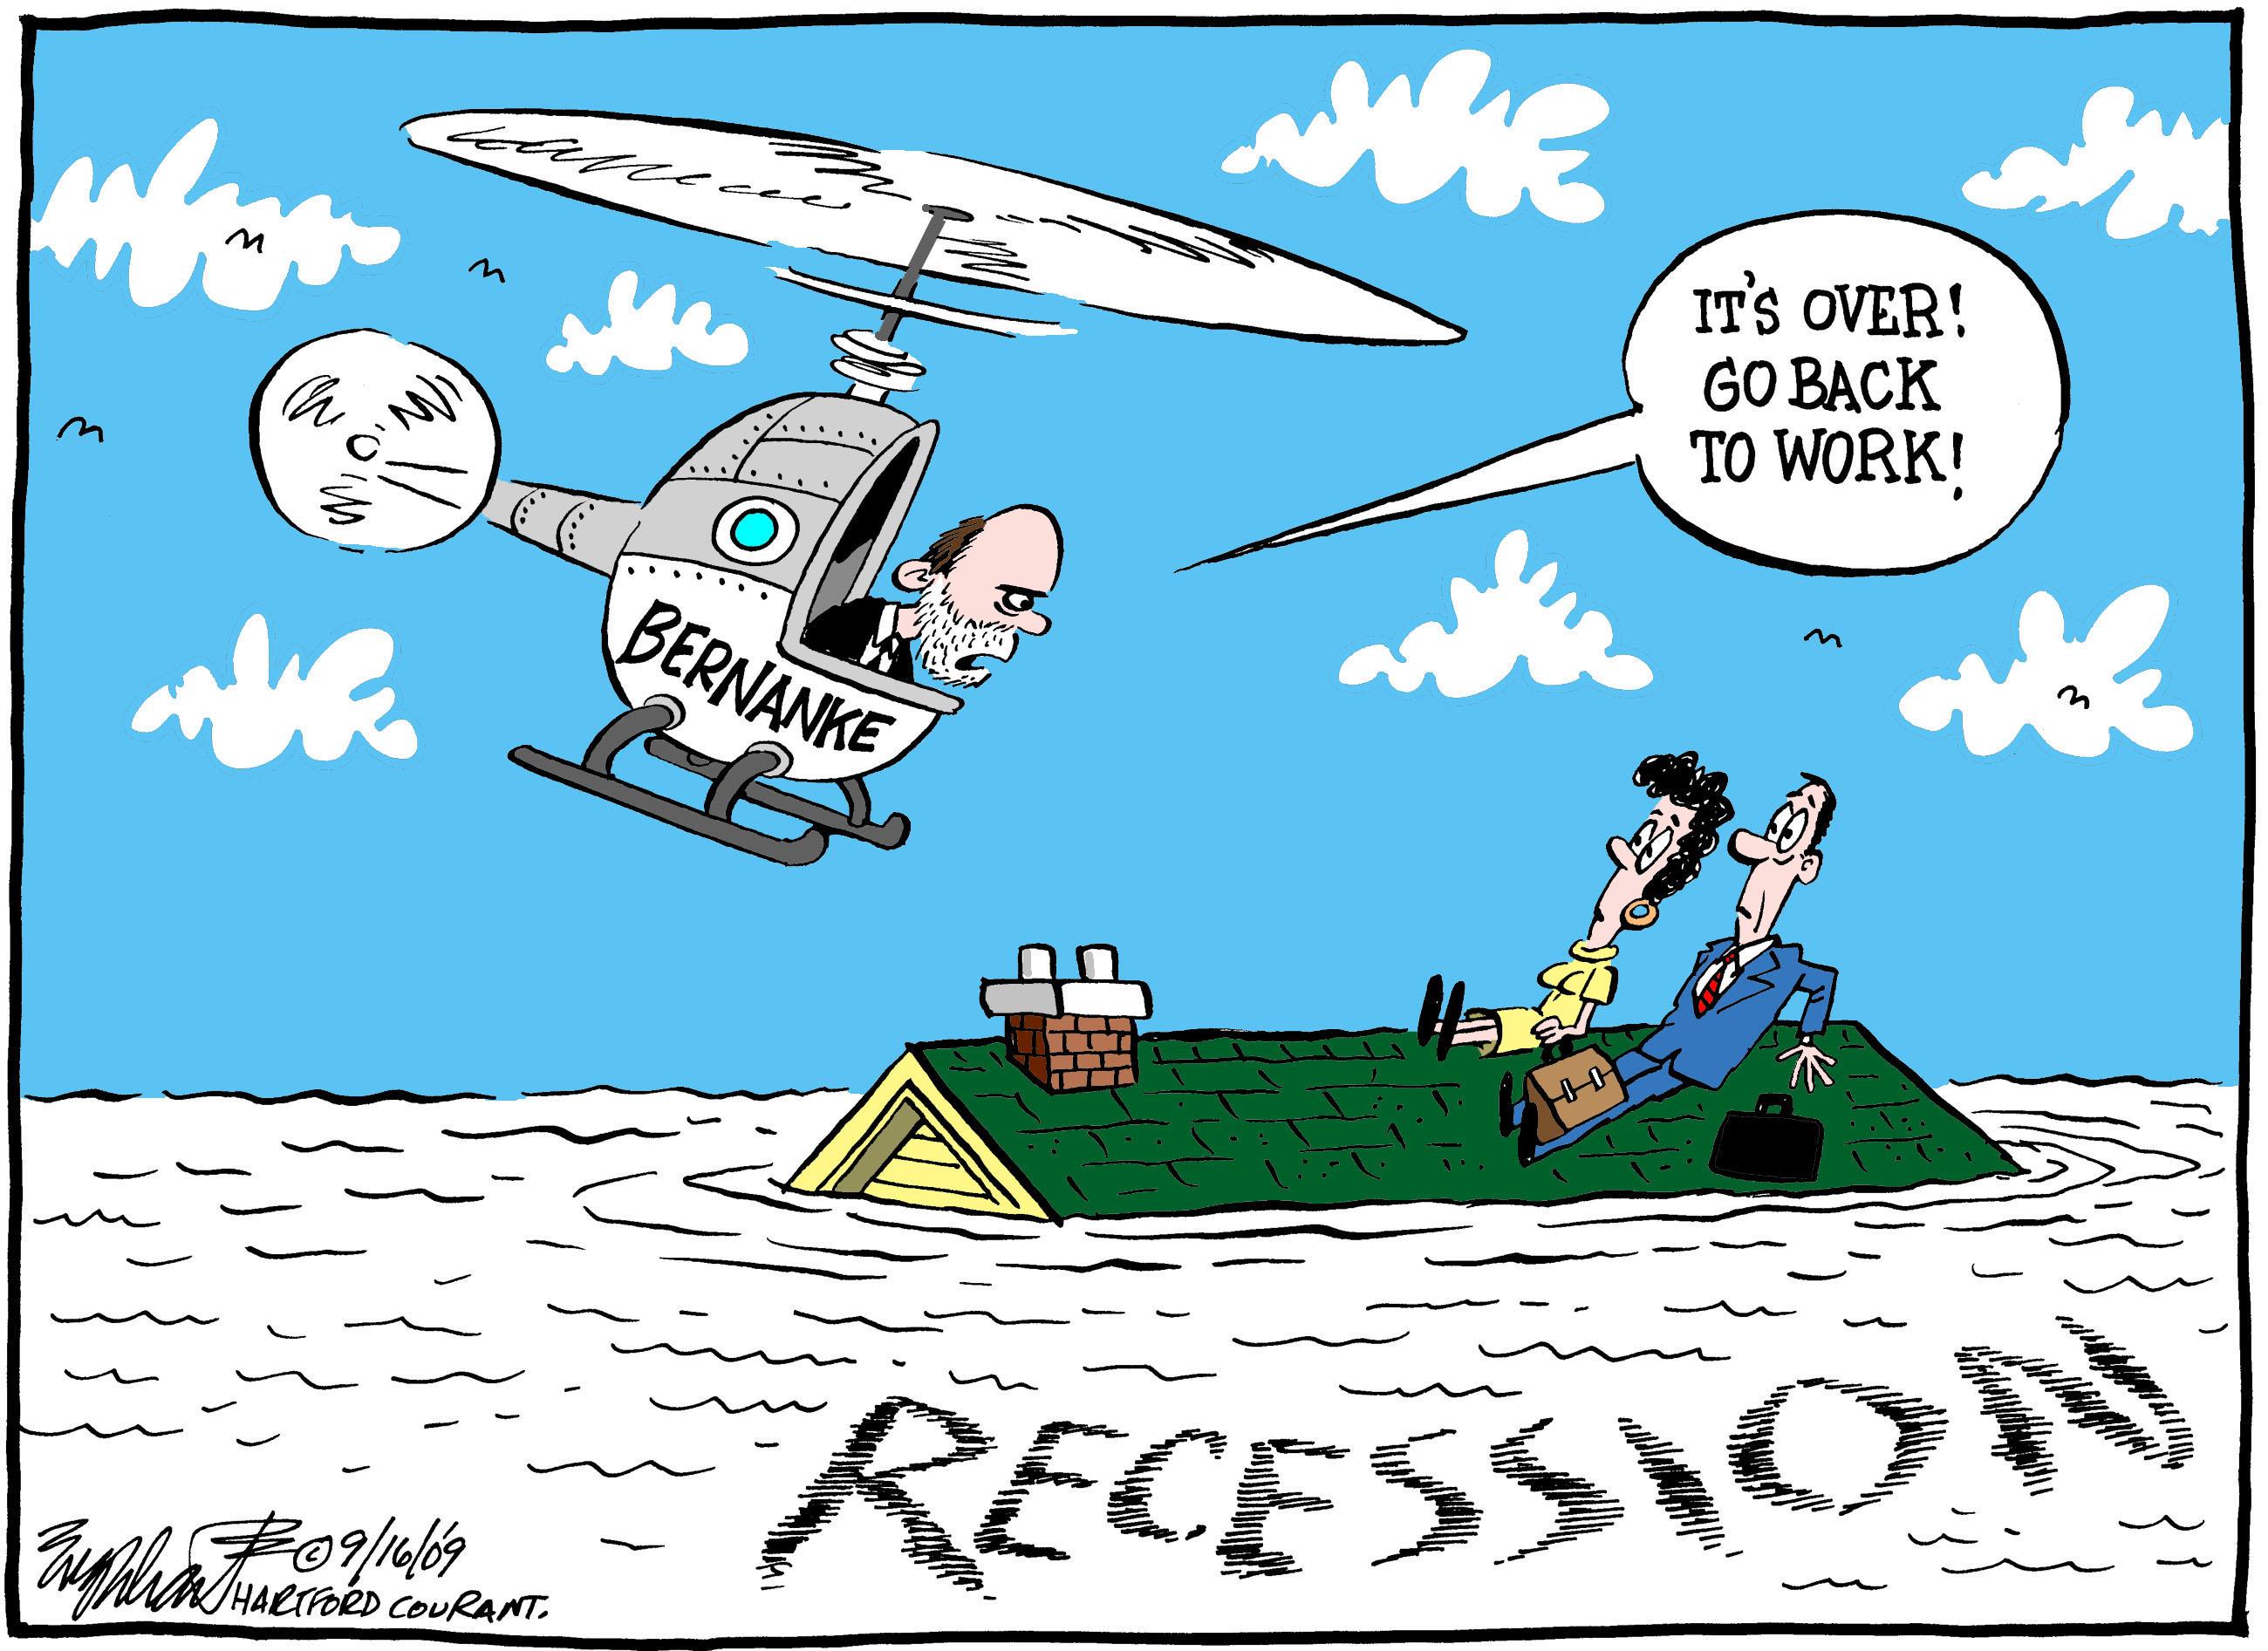 La recessione è finita, andate in pace